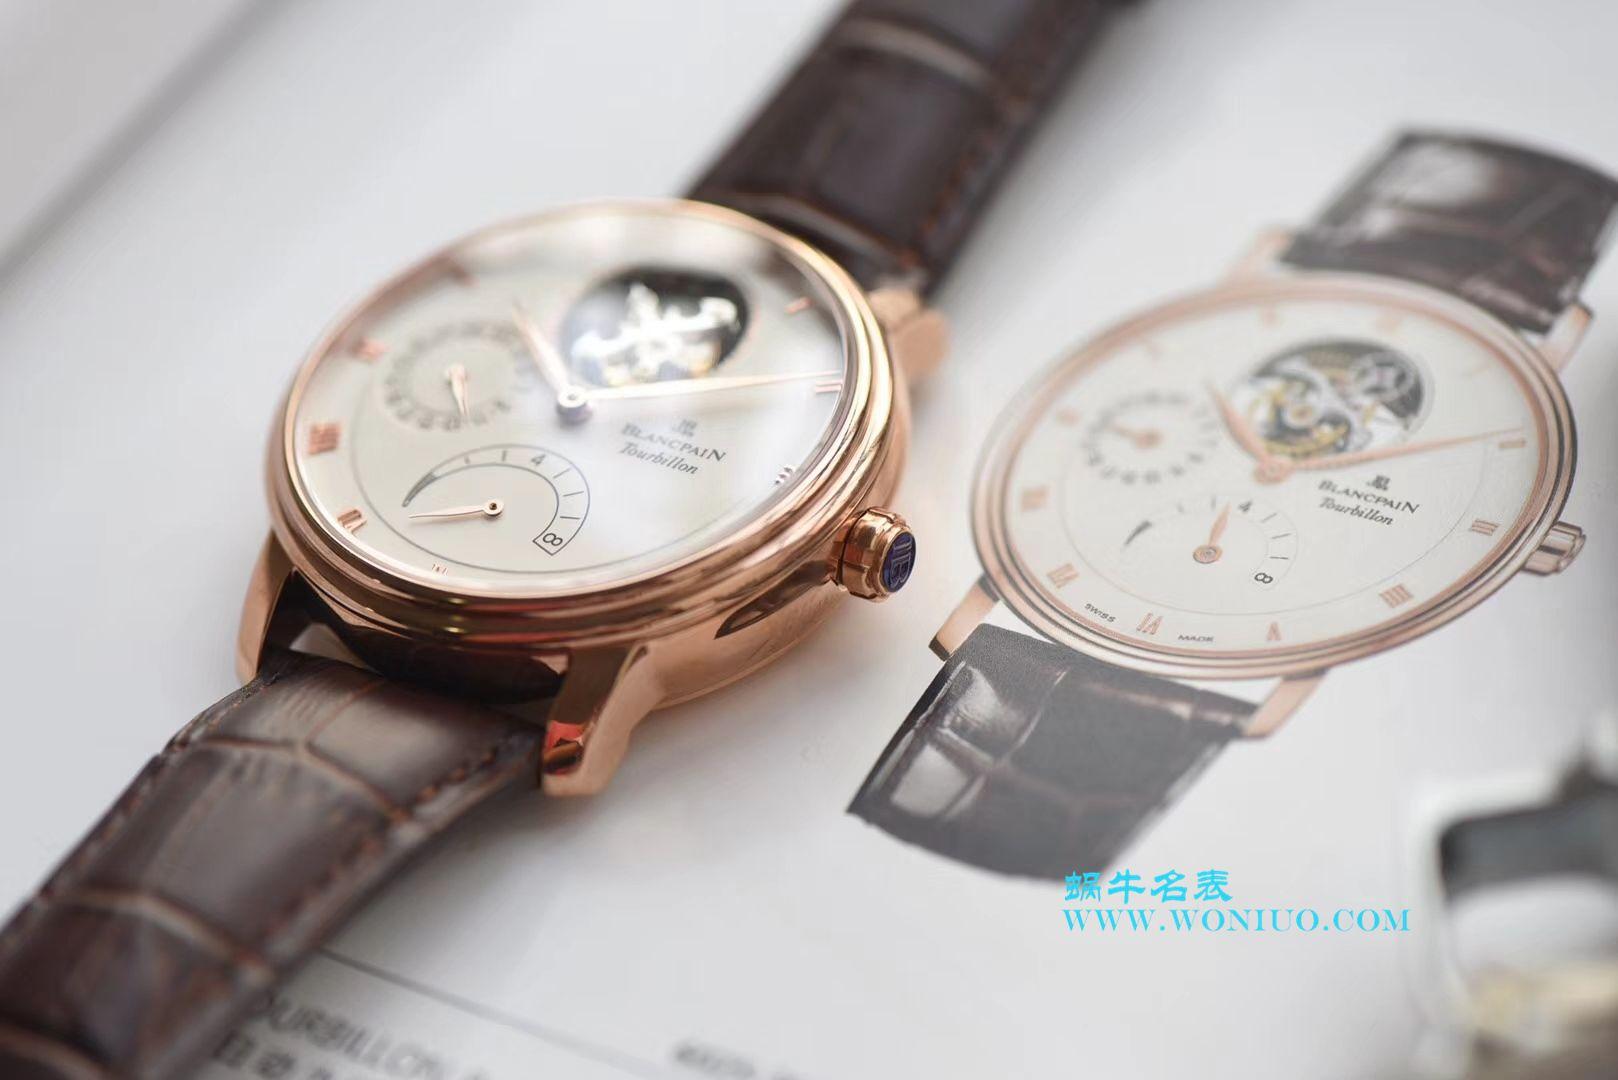 【JB厂顶级复刻手表】宝珀经典系列6025-3642-55B陀飞轮腕表 / BP042